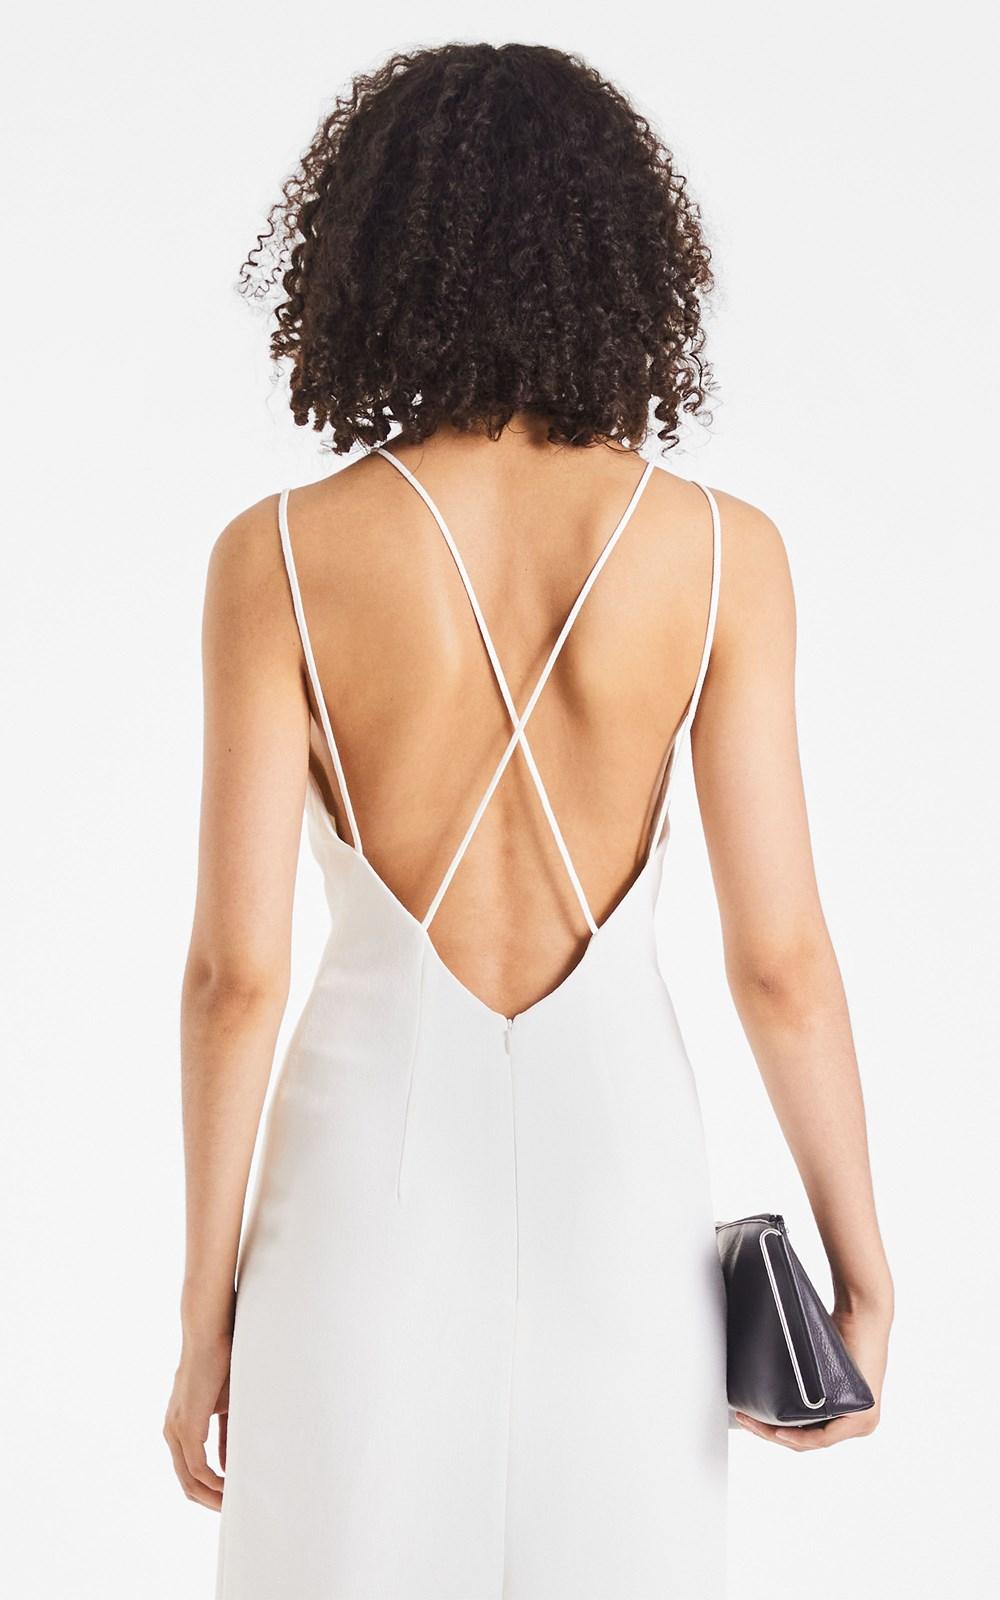 Dresses | WHITEWASH LINK SLIP DRESS